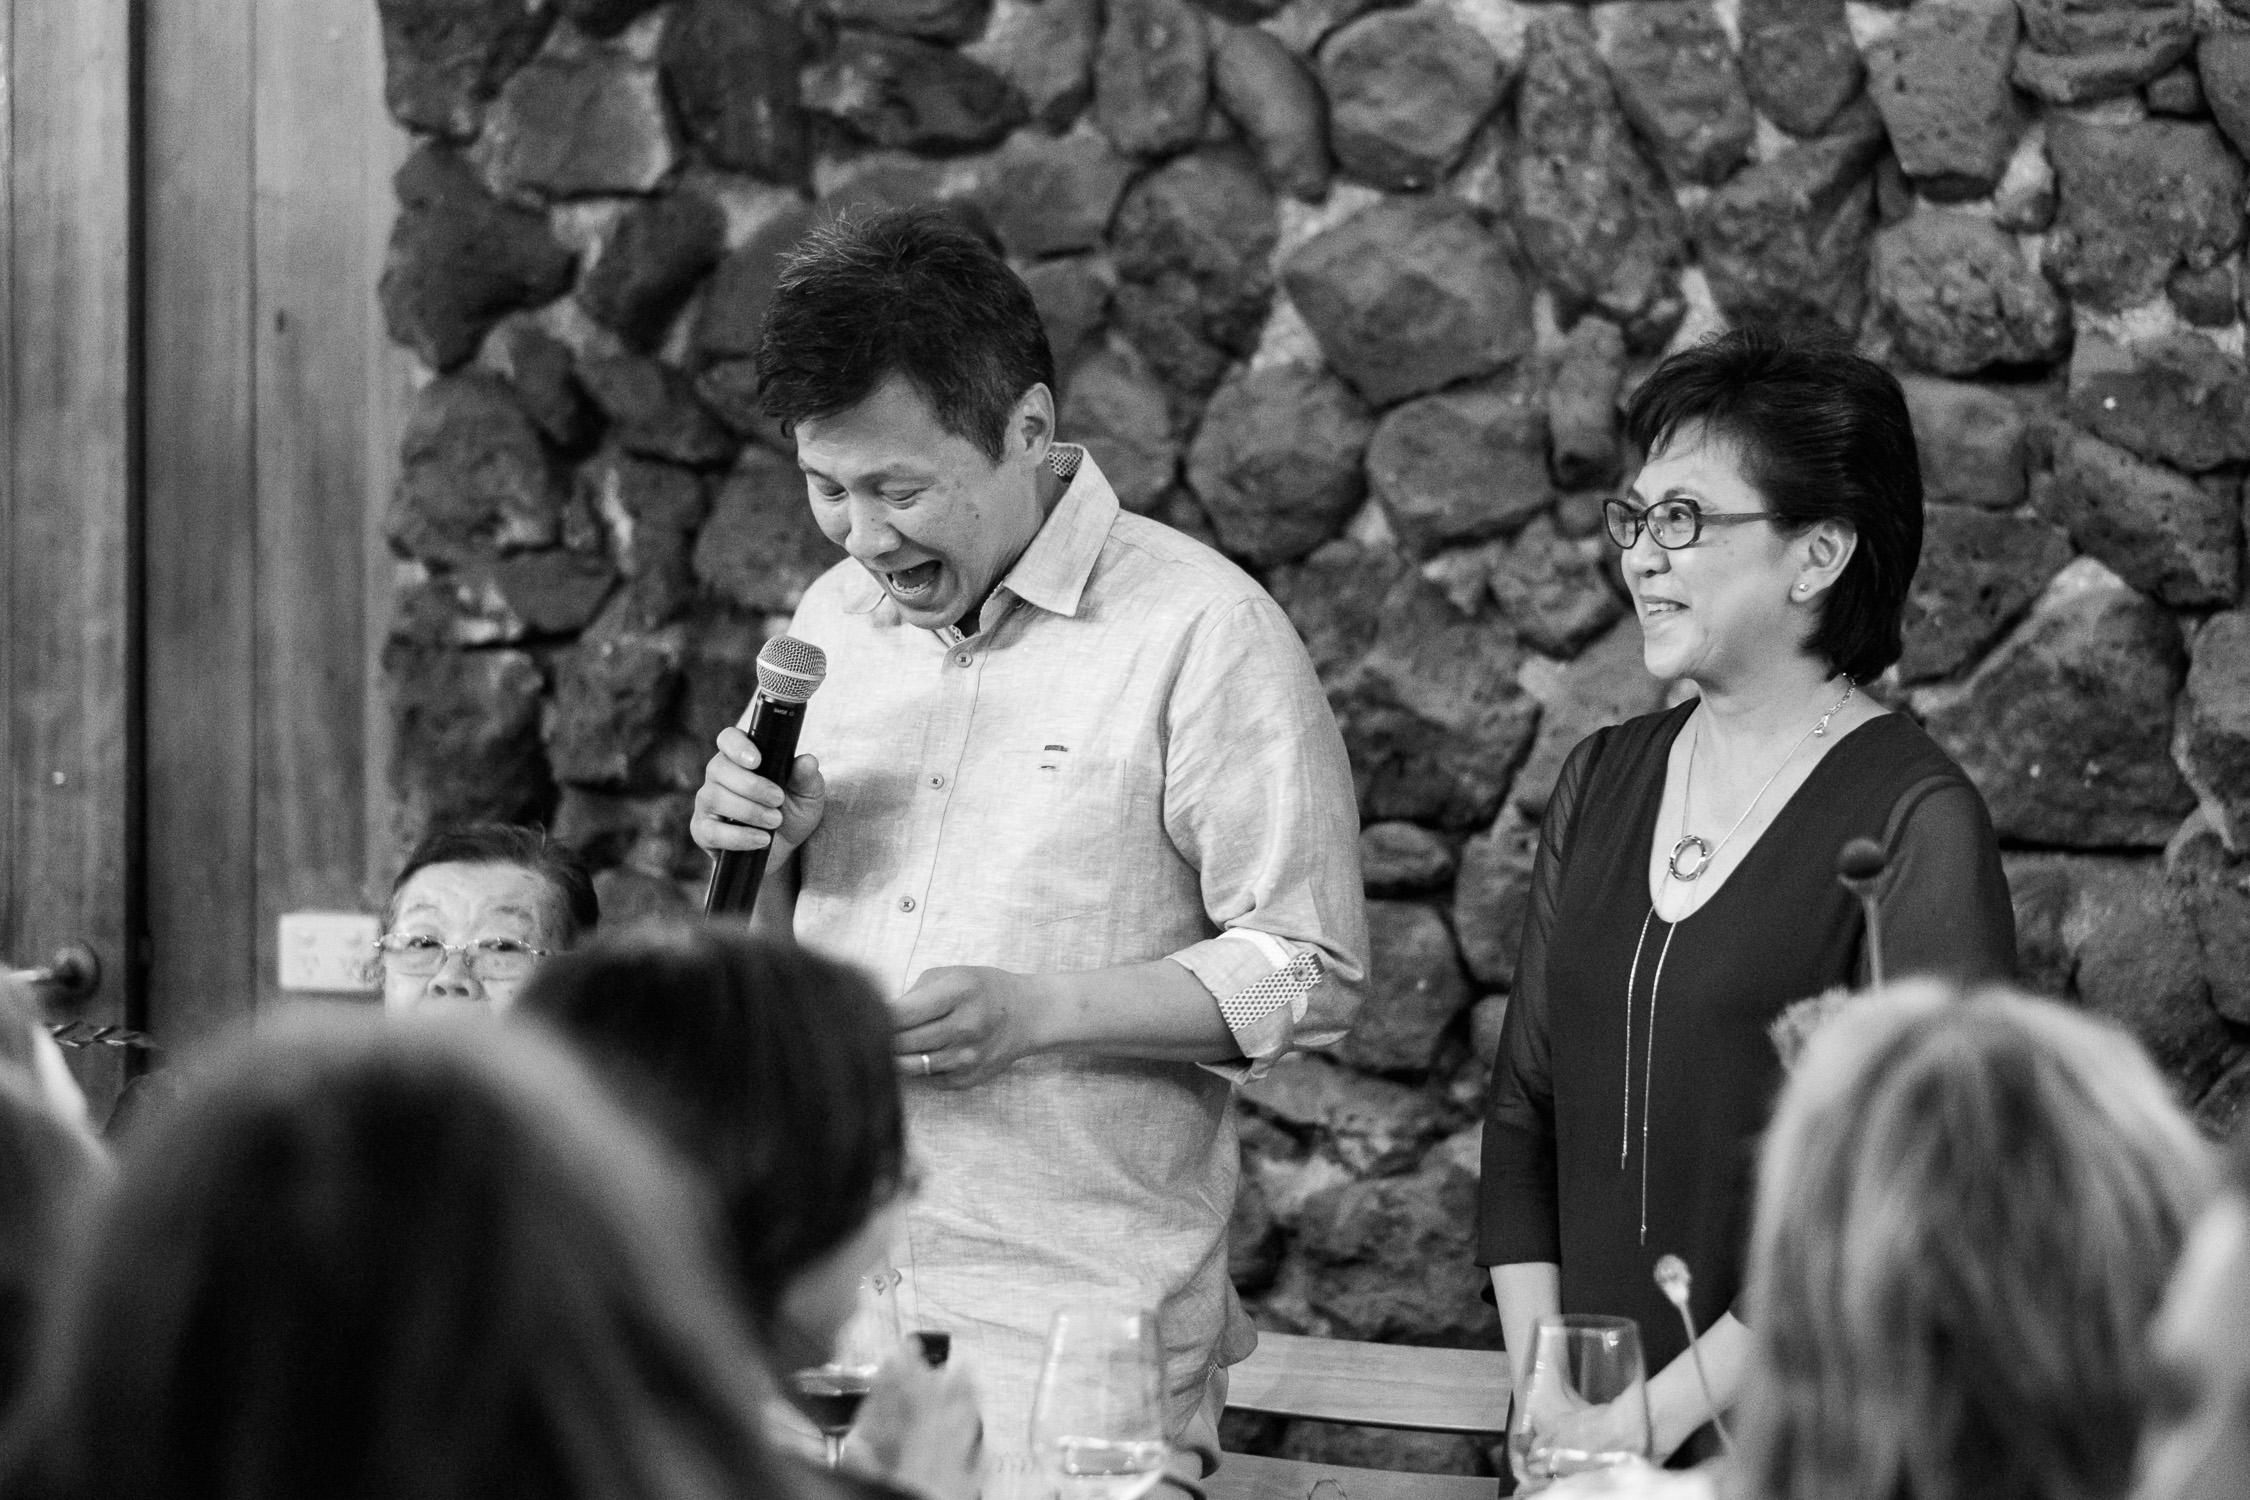 Melbourne Sunnystones Camp Wedding - bride parents speech